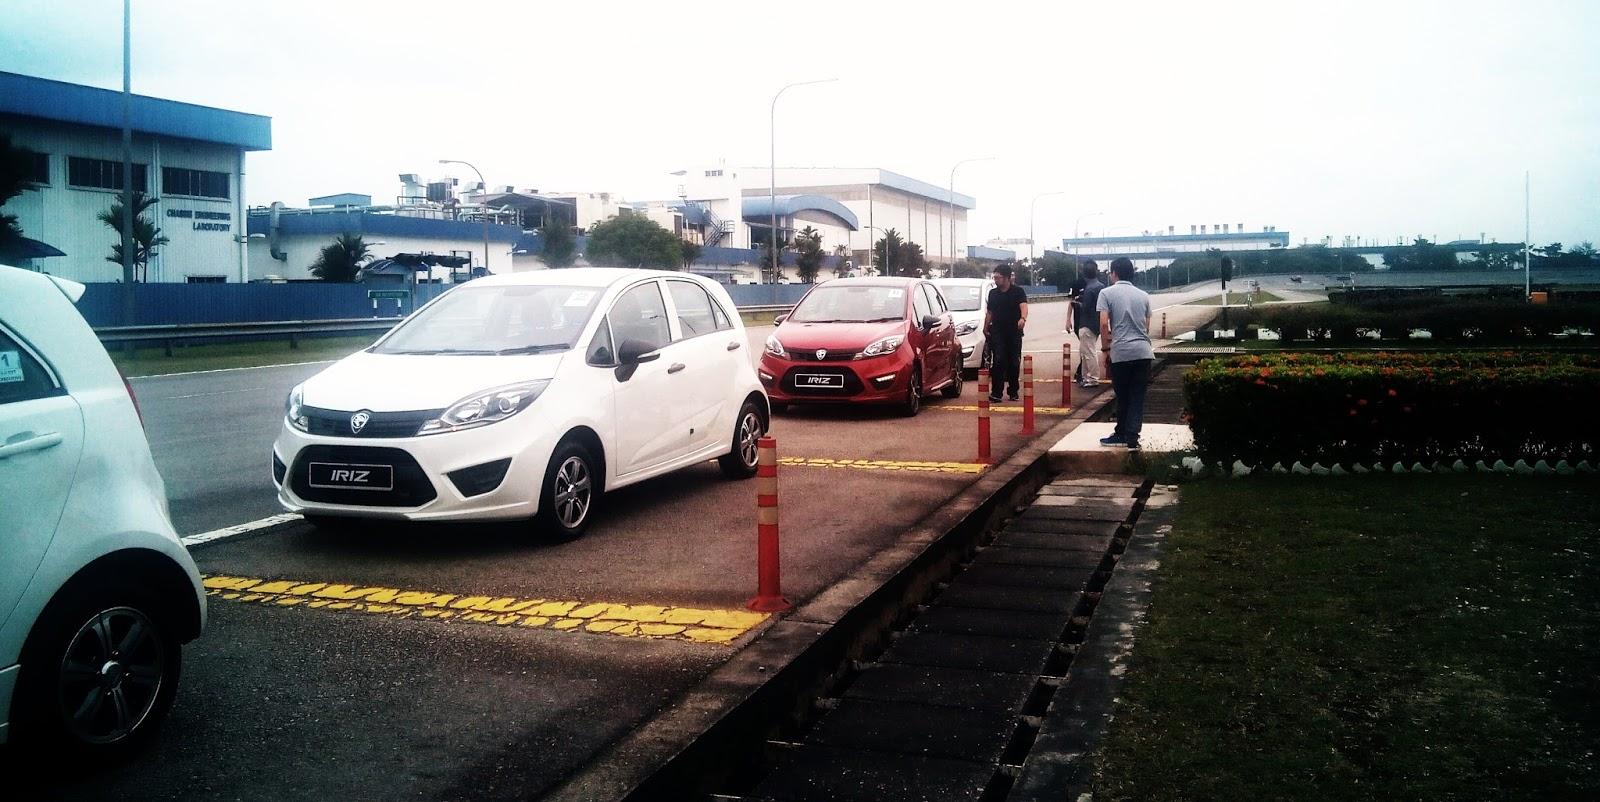 Motoring-Malaysia: TEST DRIVE: The 2017 PROTON IRIZ 1 3 & 1 6 CVT